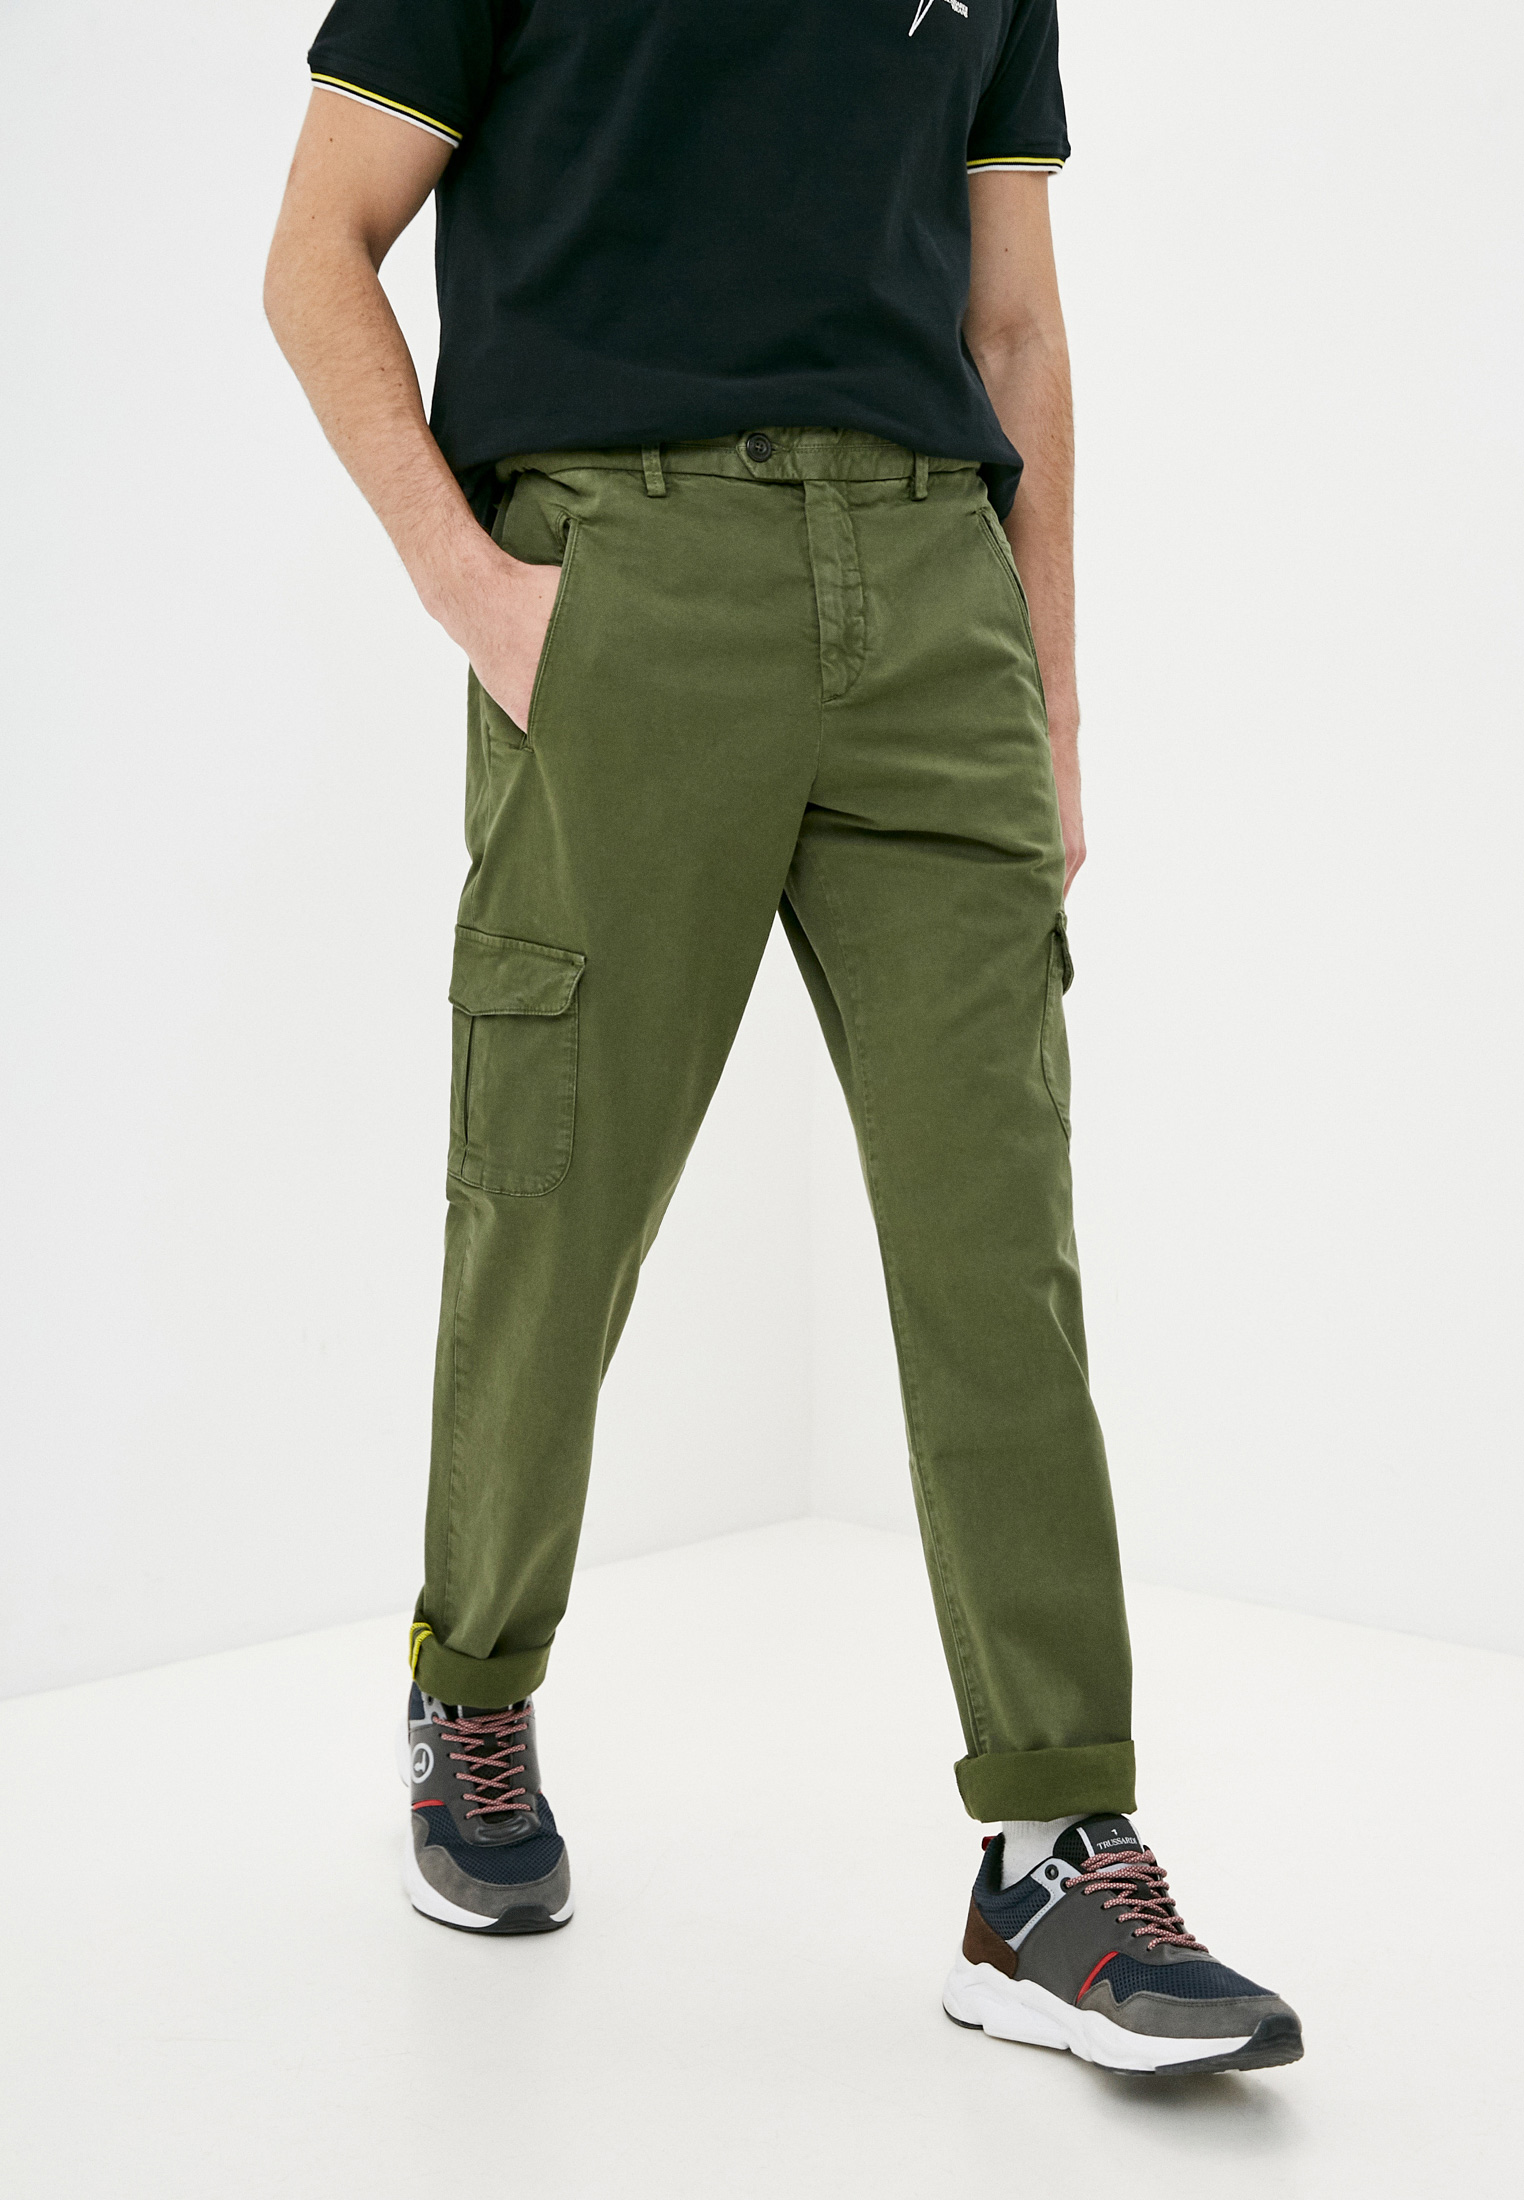 Мужские брюки Trussardi 52P00057-1T001426-H-001